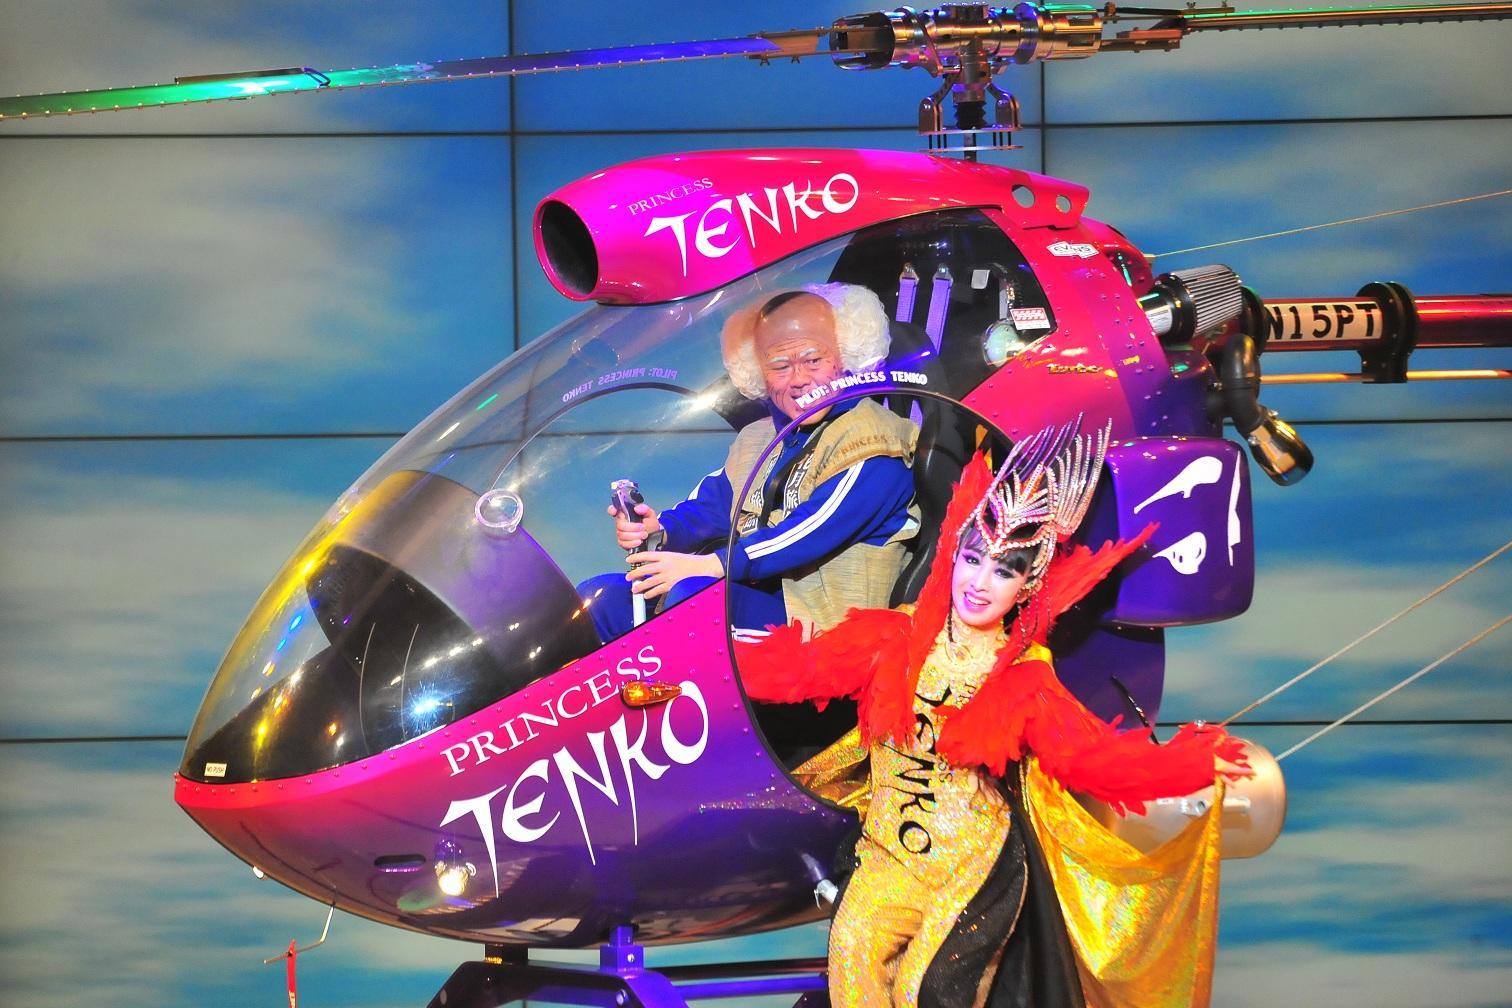 http://news.yoshimoto.co.jp/20151130203007-344b78f37abd376ff84befefe3a2060d998a0565.jpg